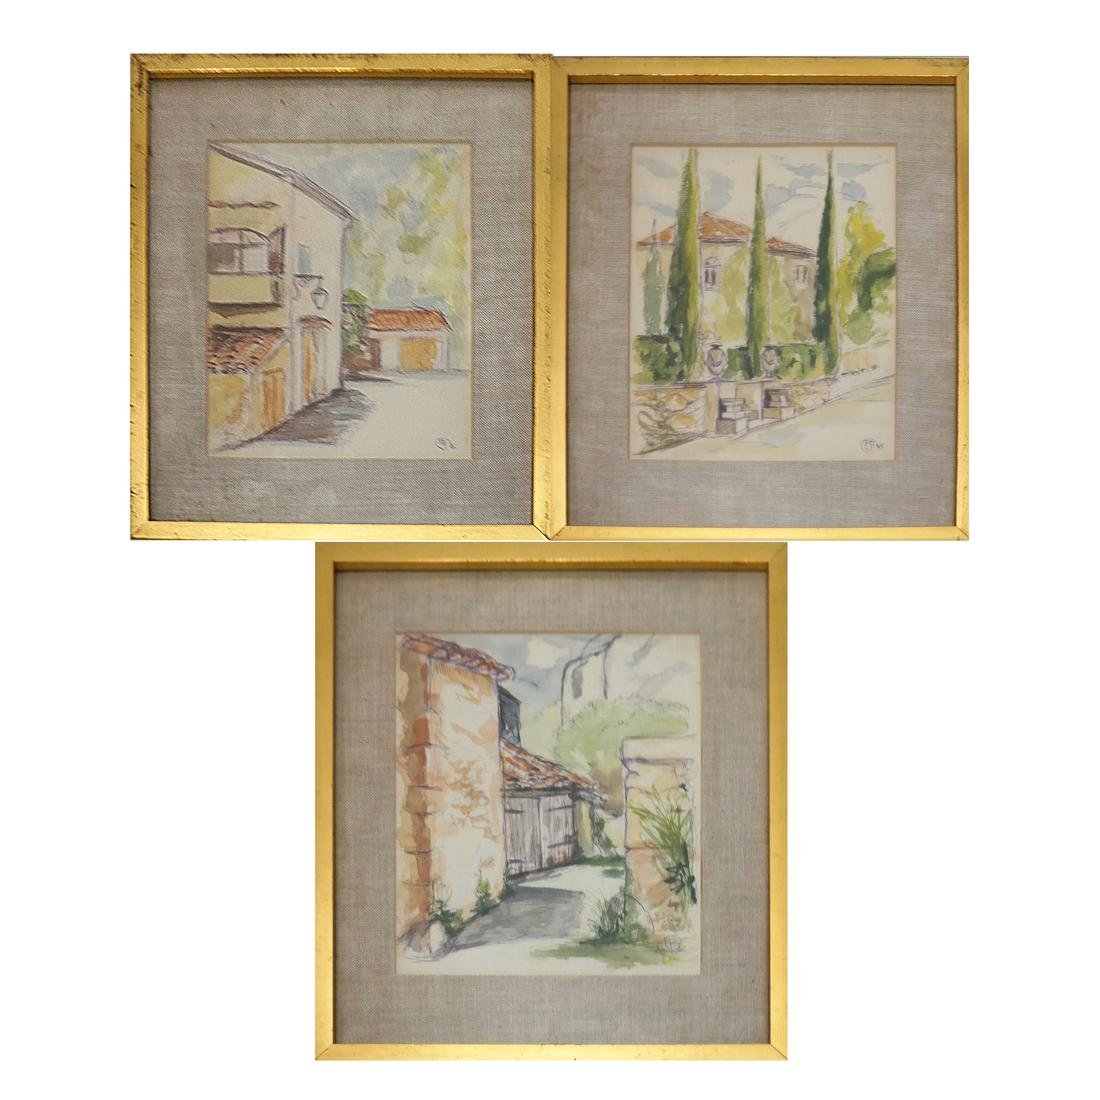 Three Village Scenes - Initialed Watercolors